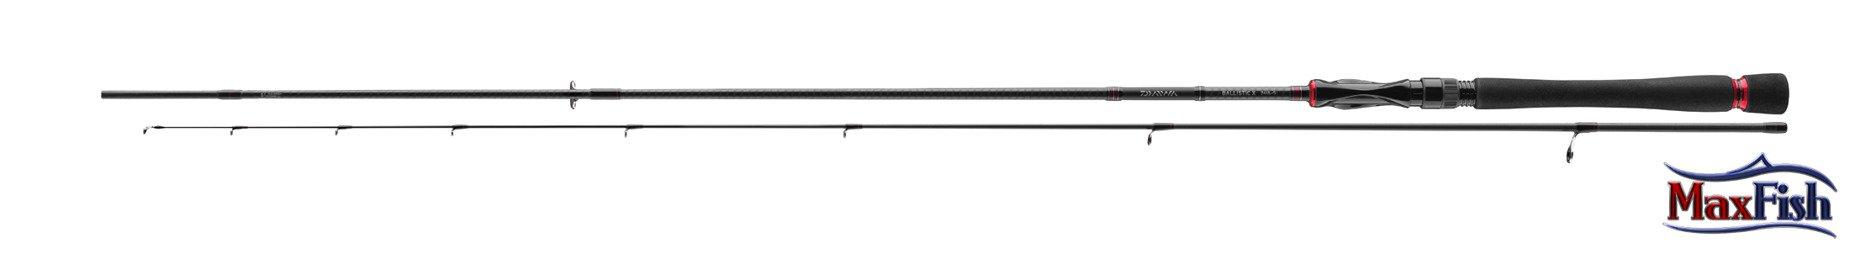 Daiwa Ballistic X UL Spin  215cm 3.5-14g